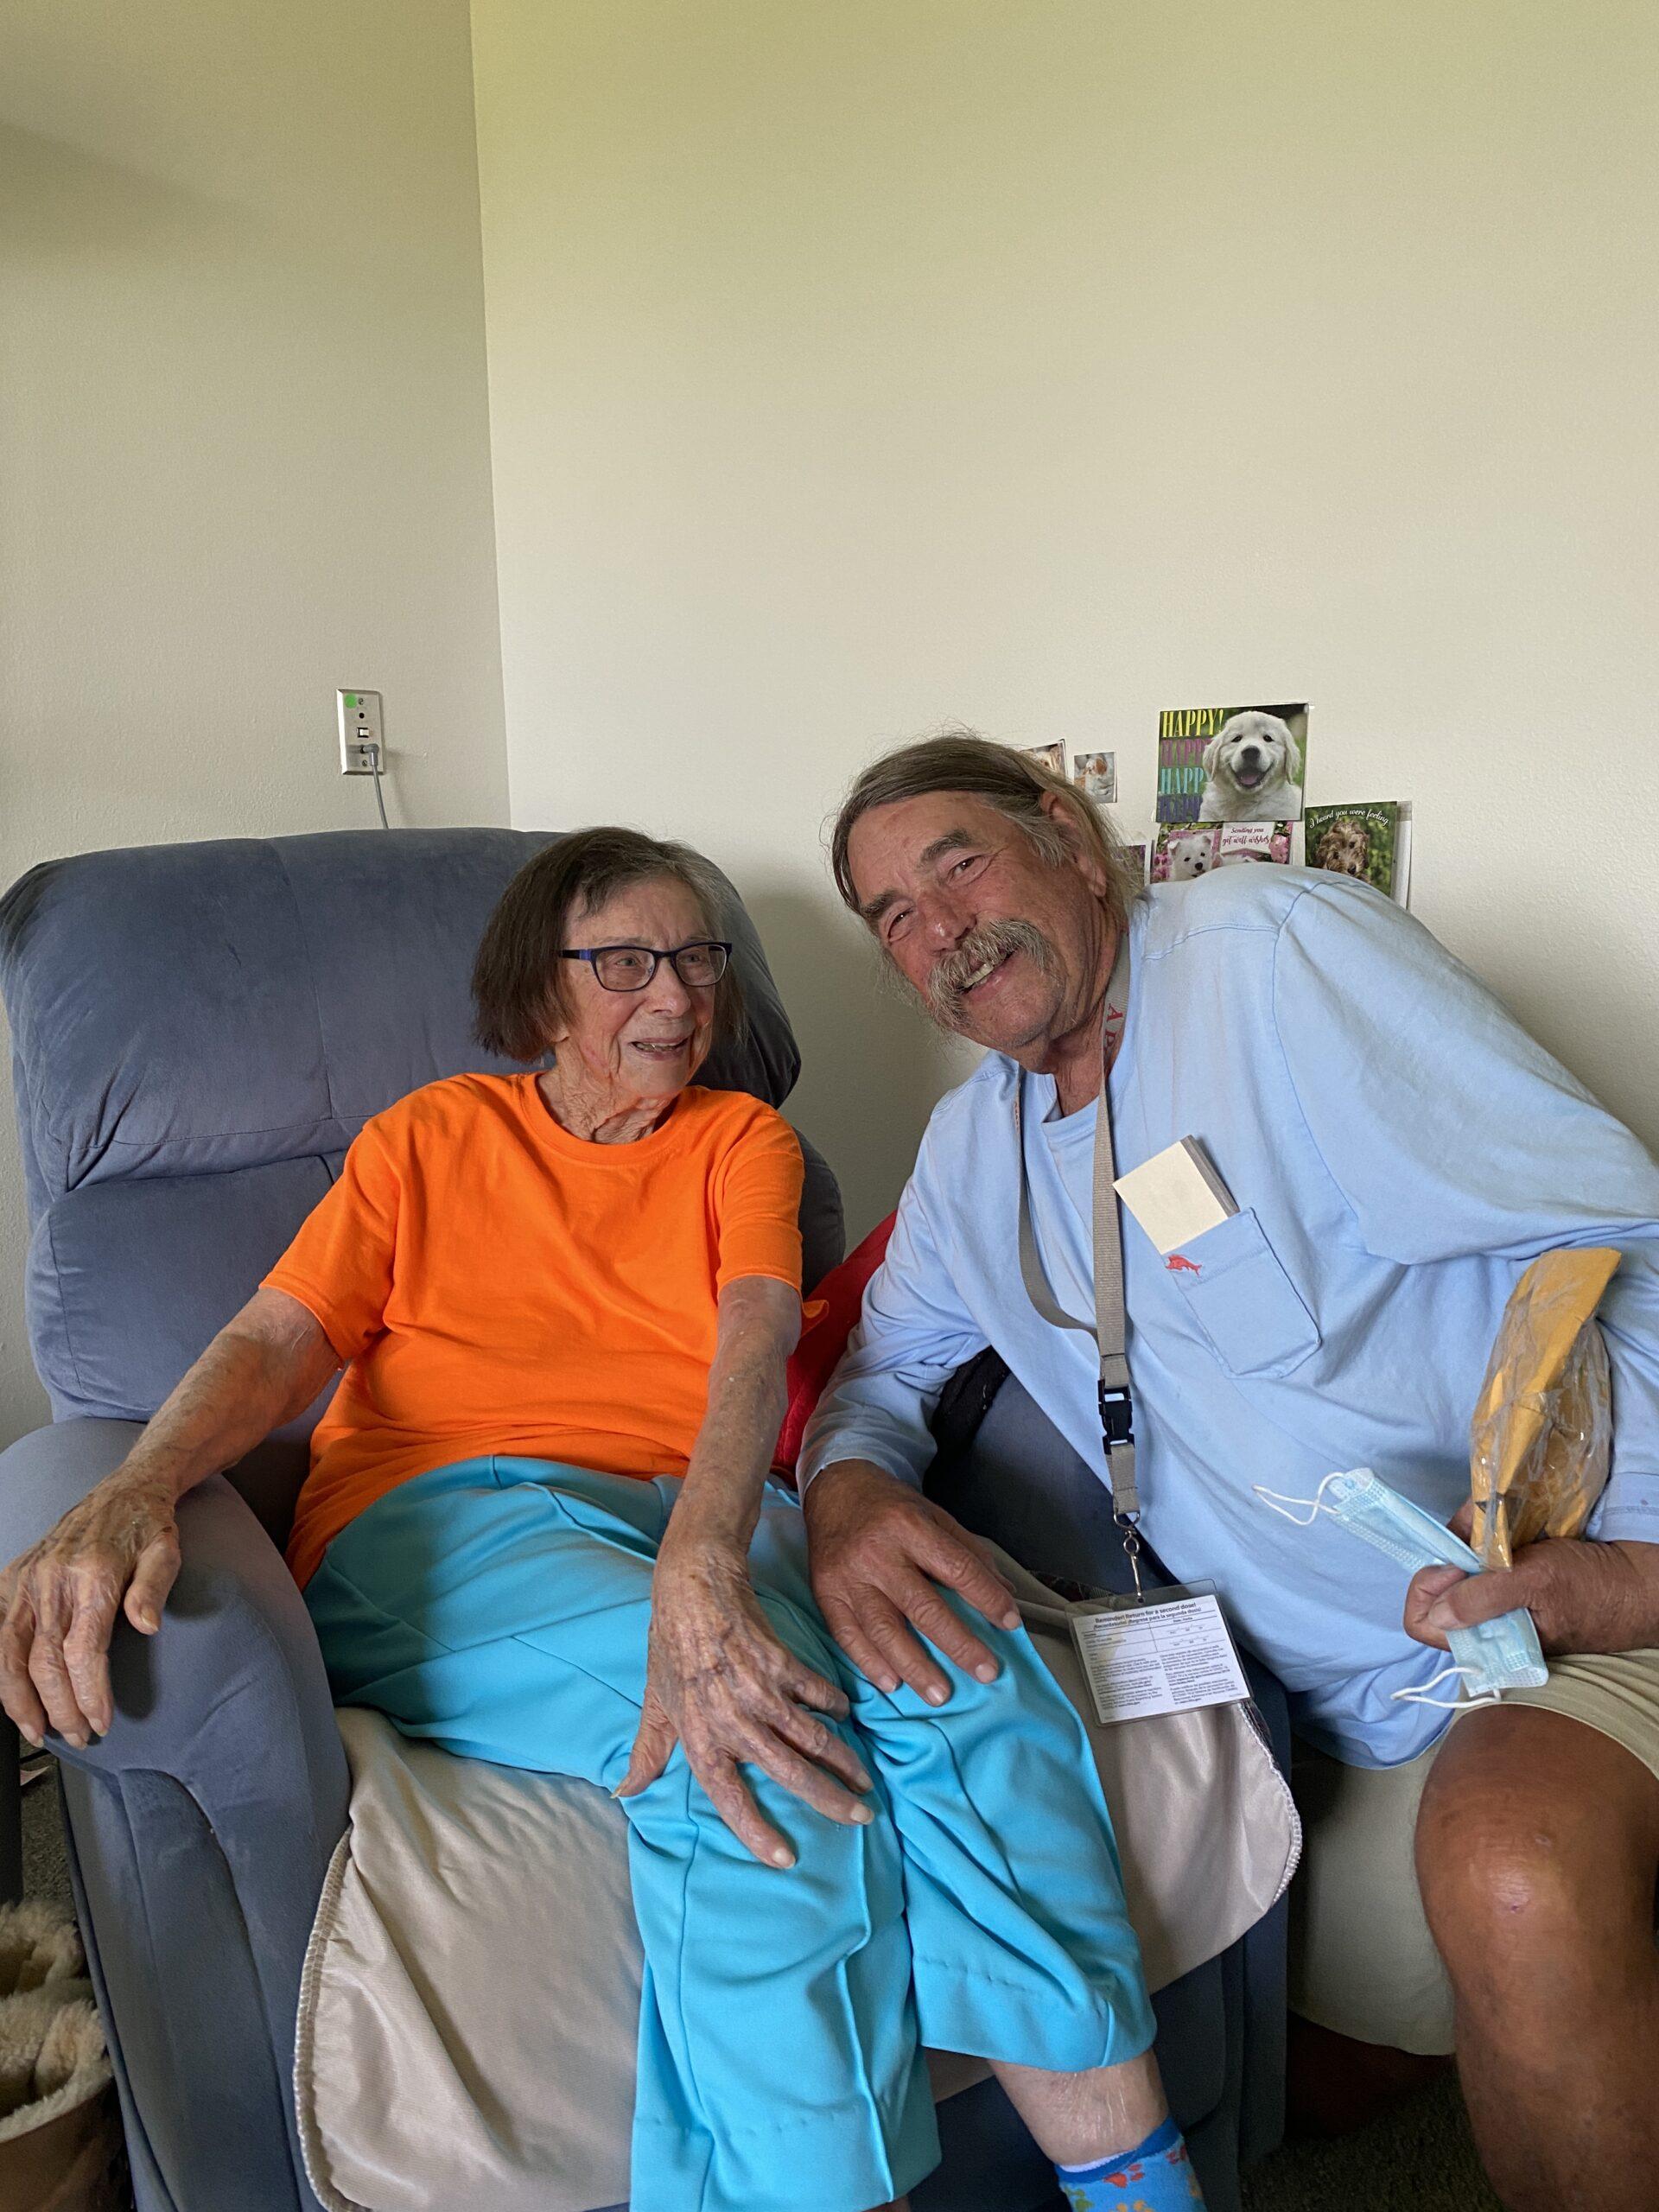 Bub's 100 year old mom, Jean Baker